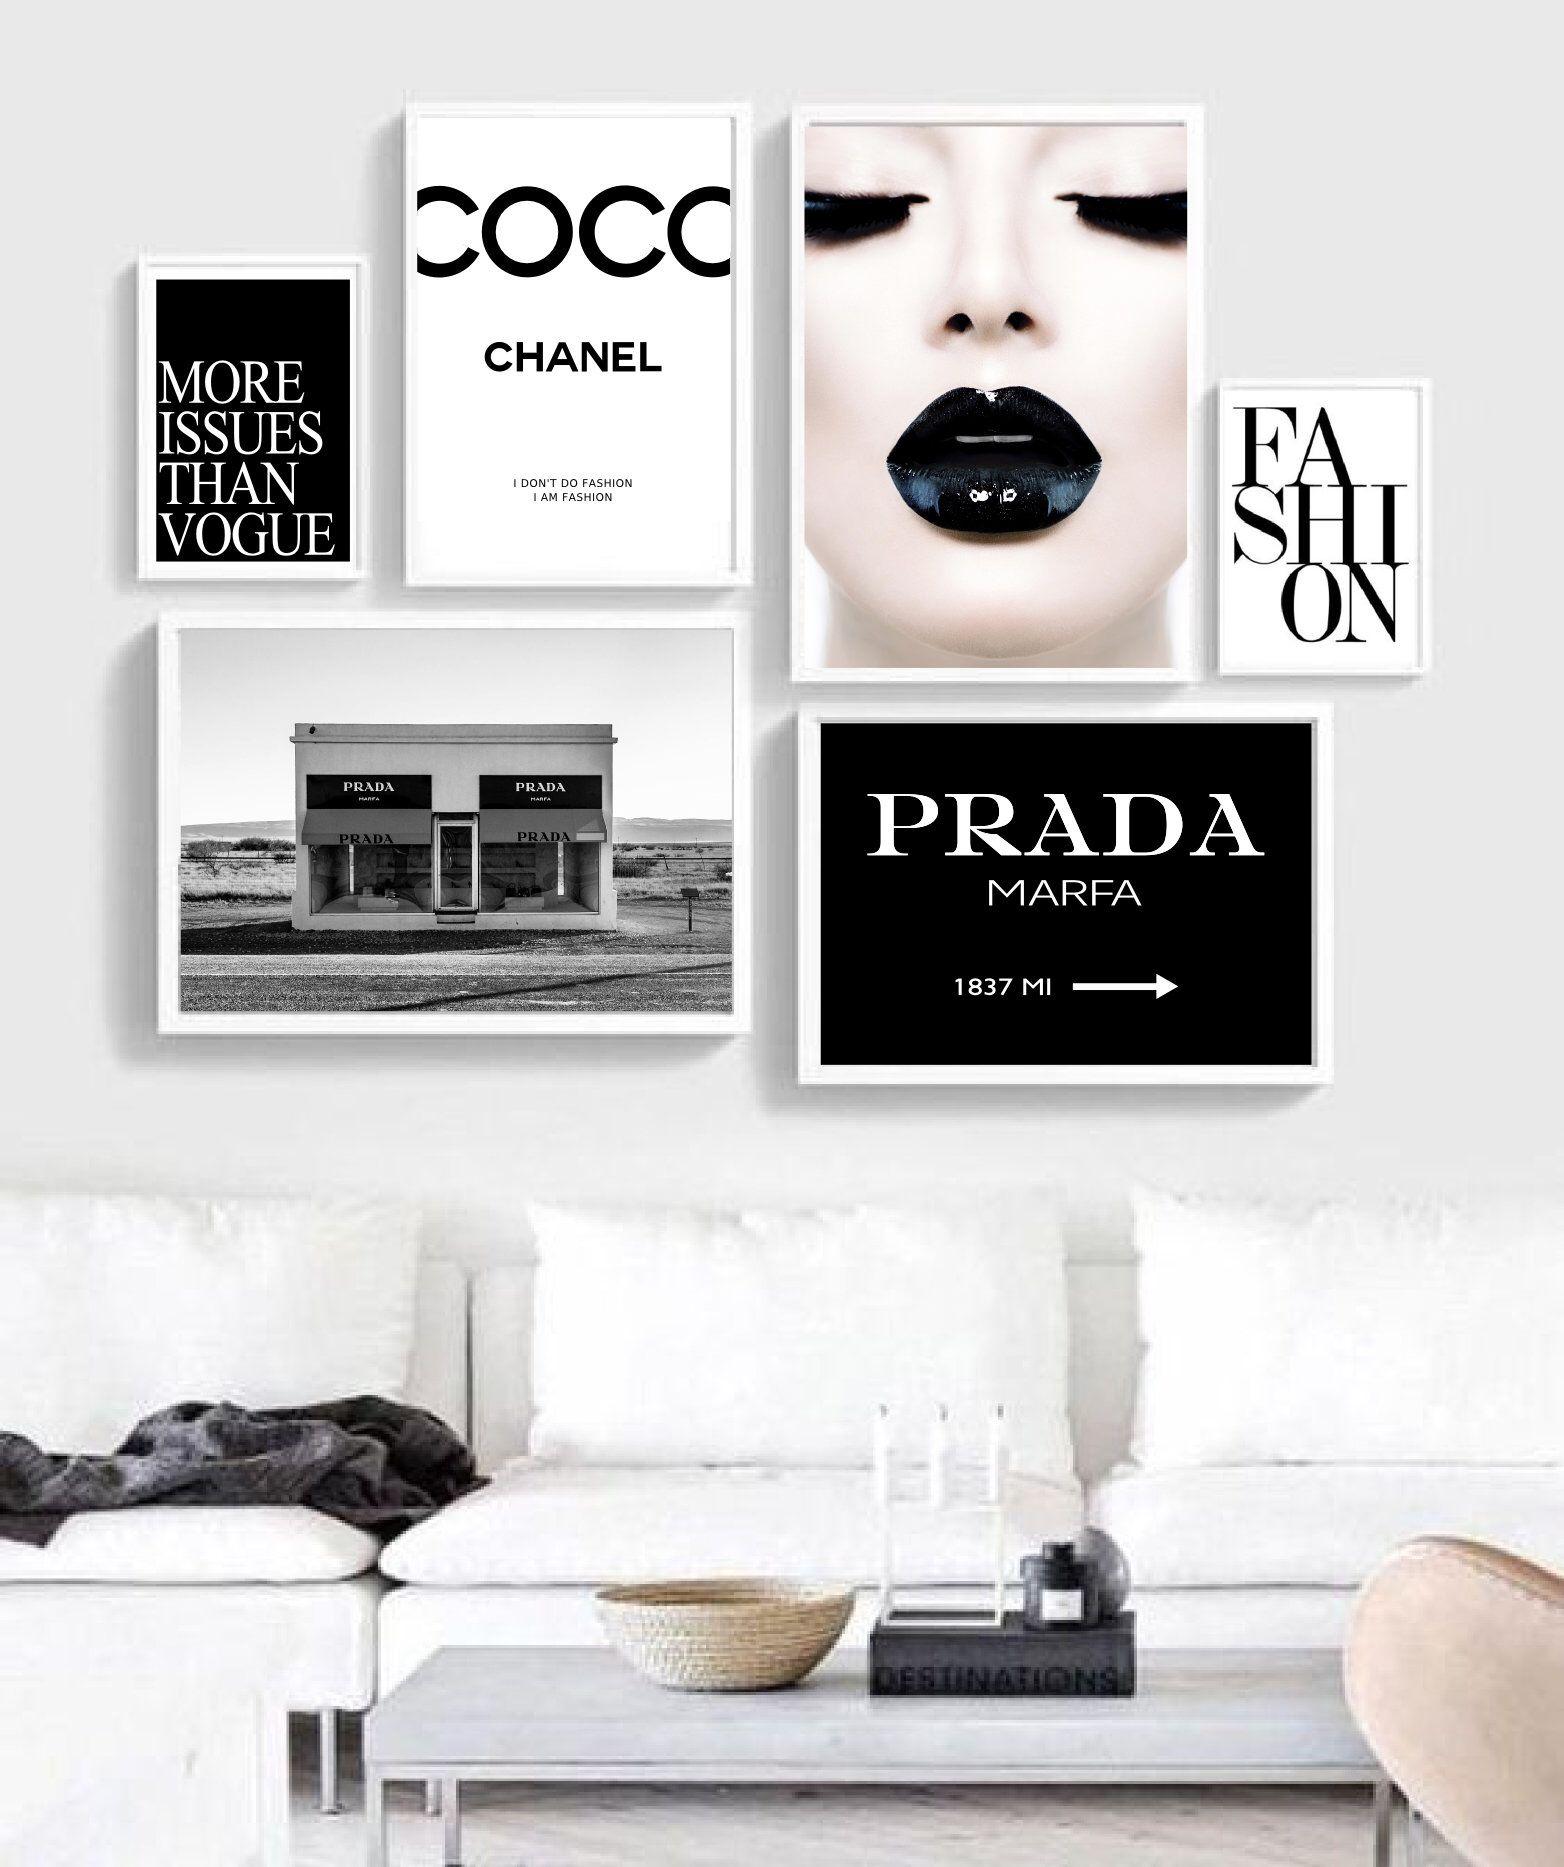 Fashion Wall Art Prints Fashion Wallgallery Wallartprints Posters Interiors Fashion Wall Art Bedroom Decor Makeup Room Decor Chanel Room